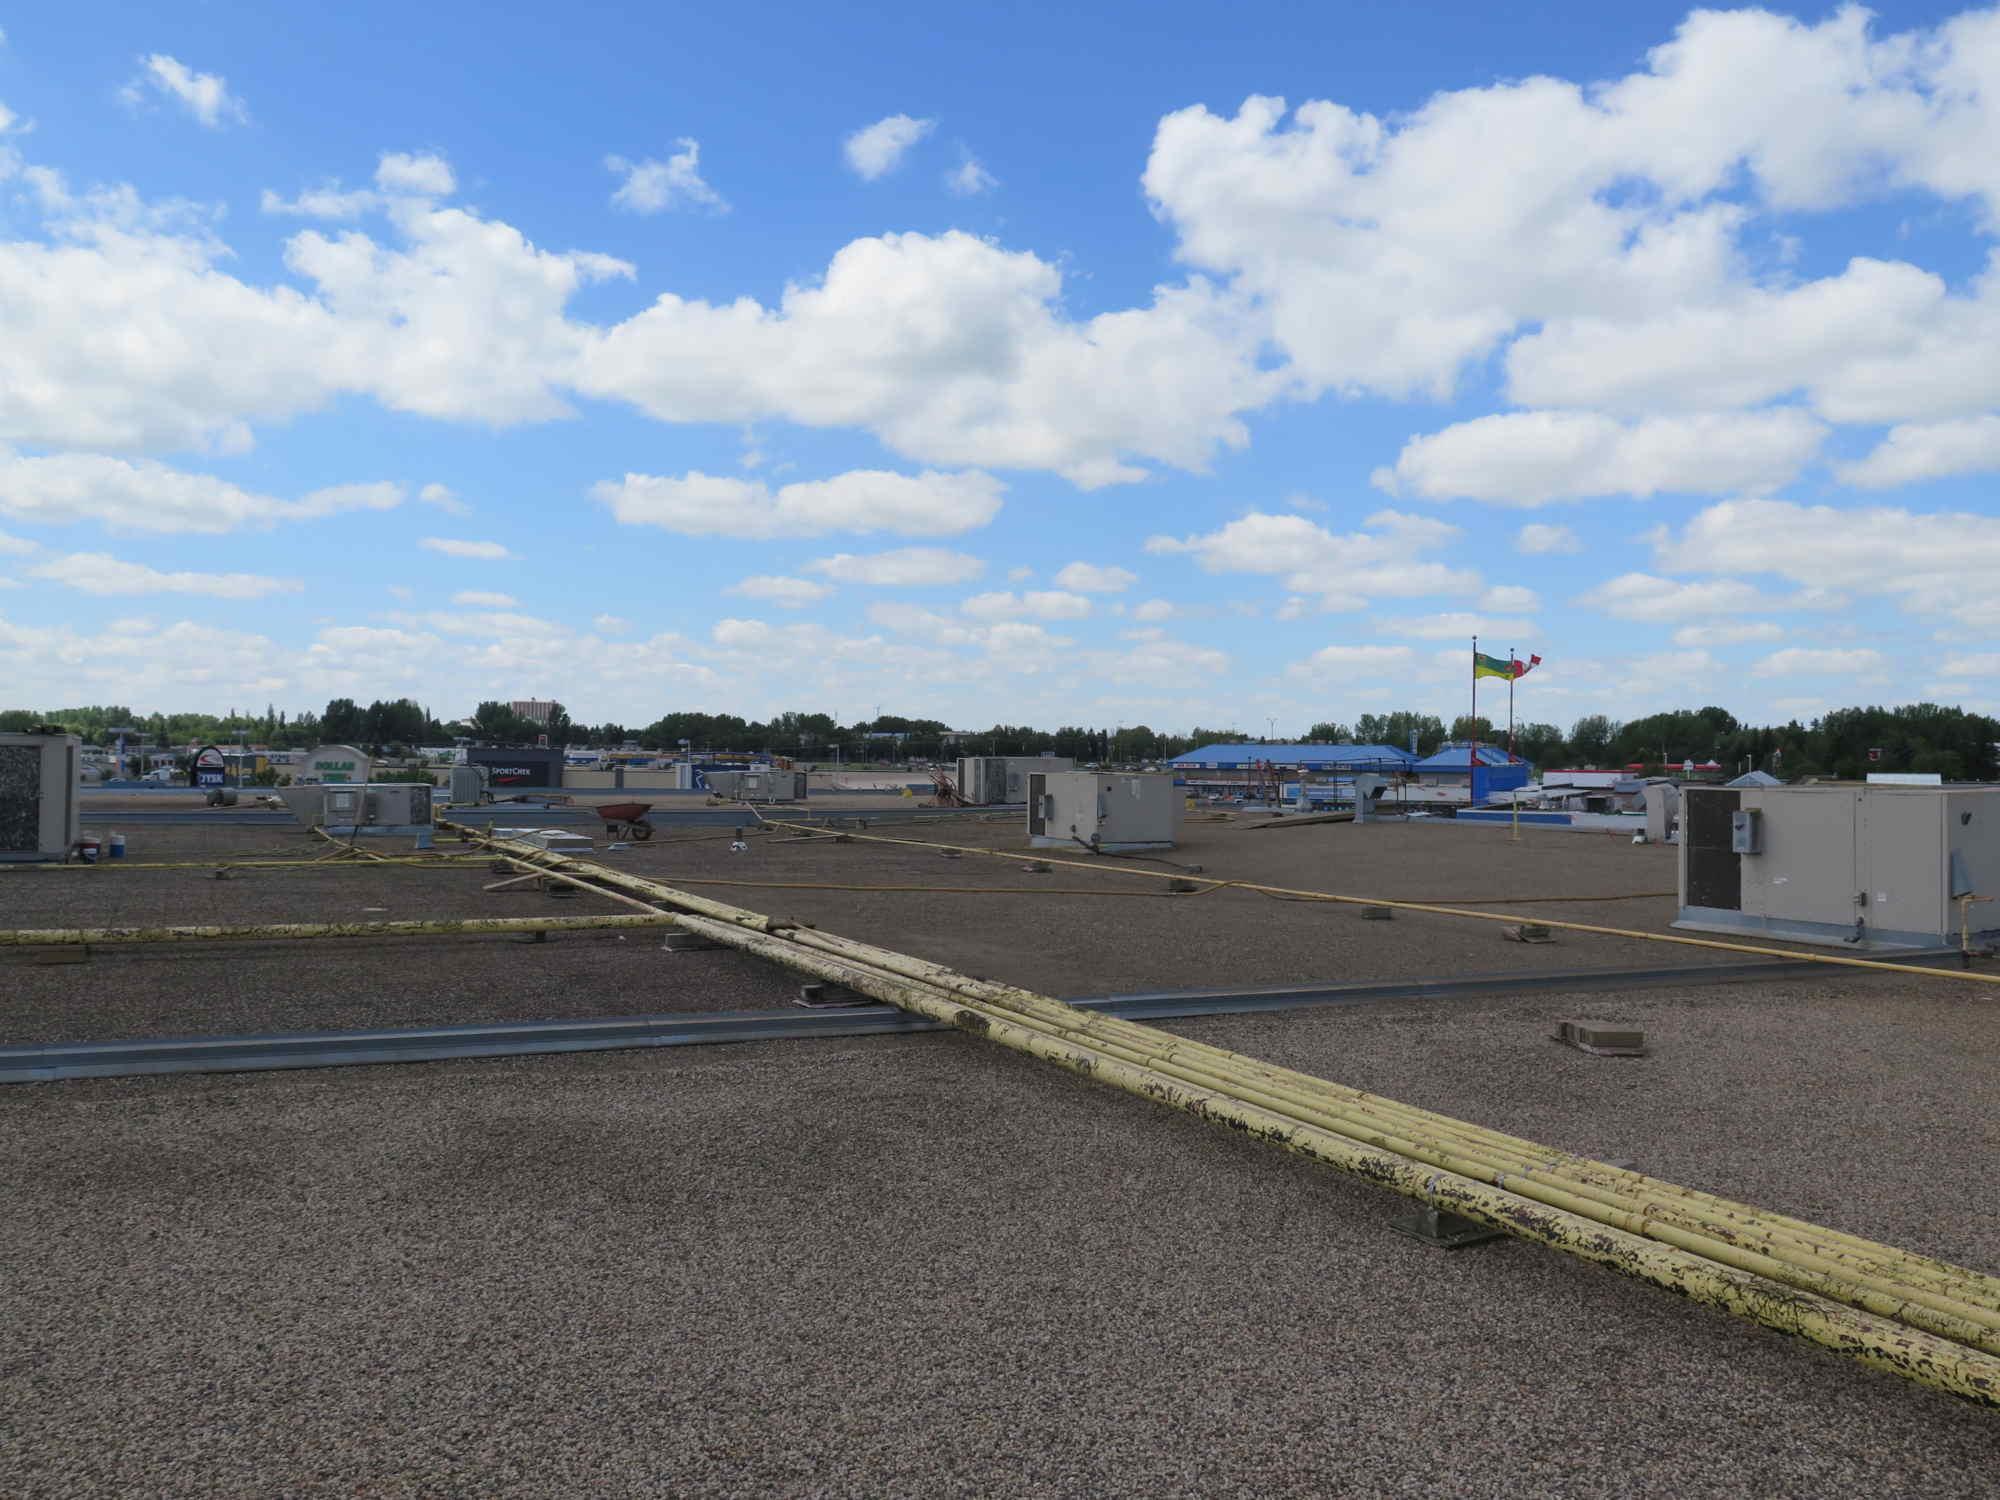 Commercial Roofing Saskatchewan - Western Urethane